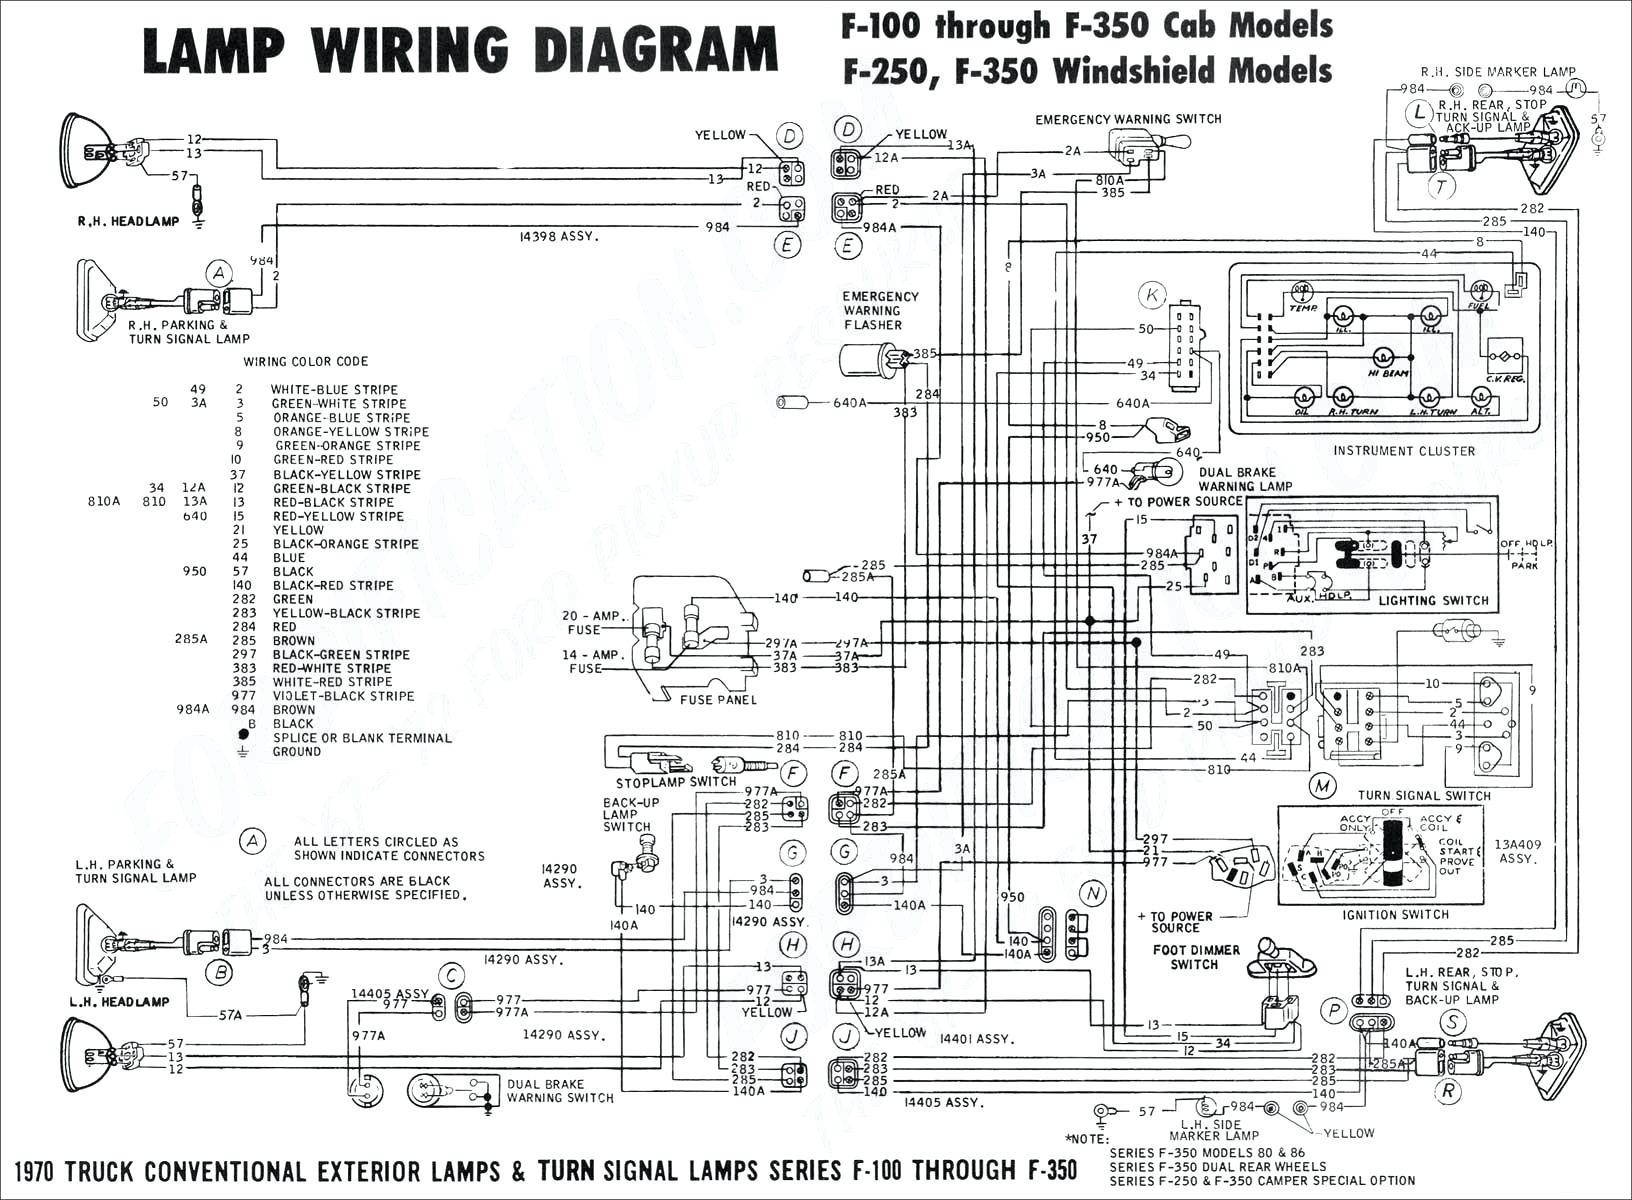 Fender S-1 Switching System Wiring Diagram Pool Light Wiring Diagram Of Fender S-1 Switching System Wiring Diagram